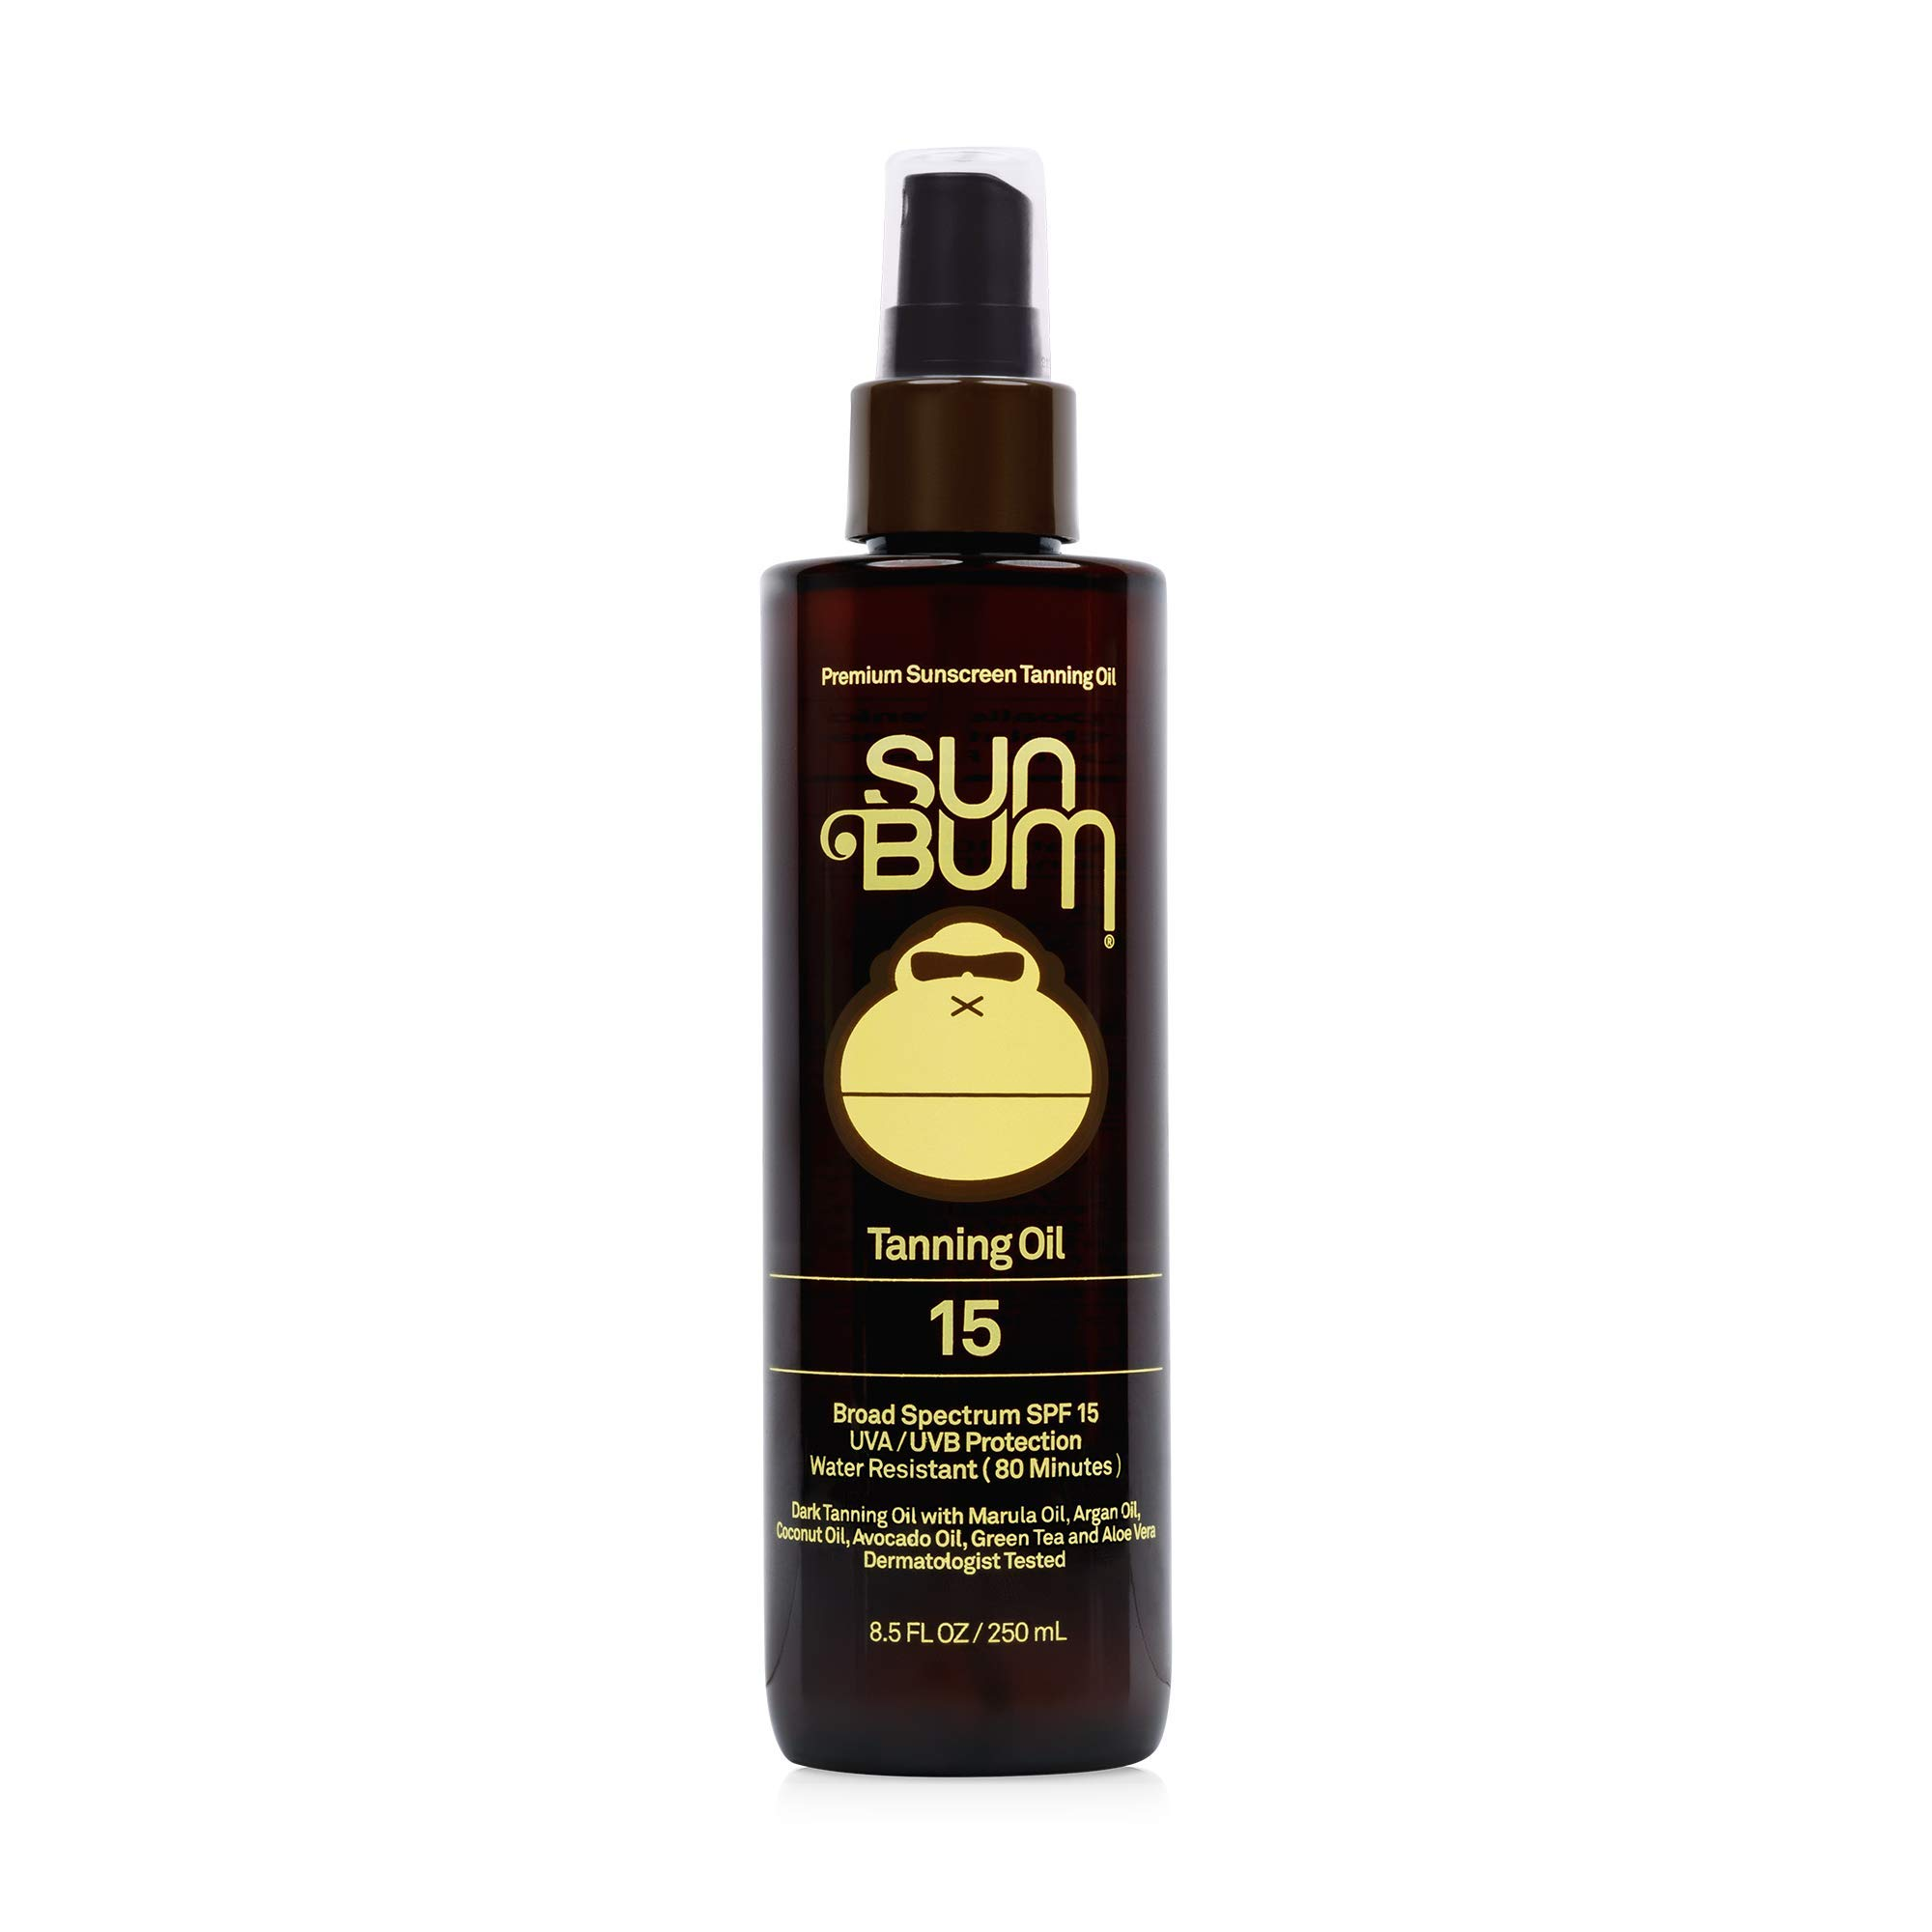 Sun Bum SPF 15 Moisturizing Tanning Oil | Broad Spectrum UVA/UVB Protection | Coconut Oil, Aloe Vera, Hypoallergenic, Paraben Free, Gluten Free, Vegan | 8.5 oz Bottle, 1 Count